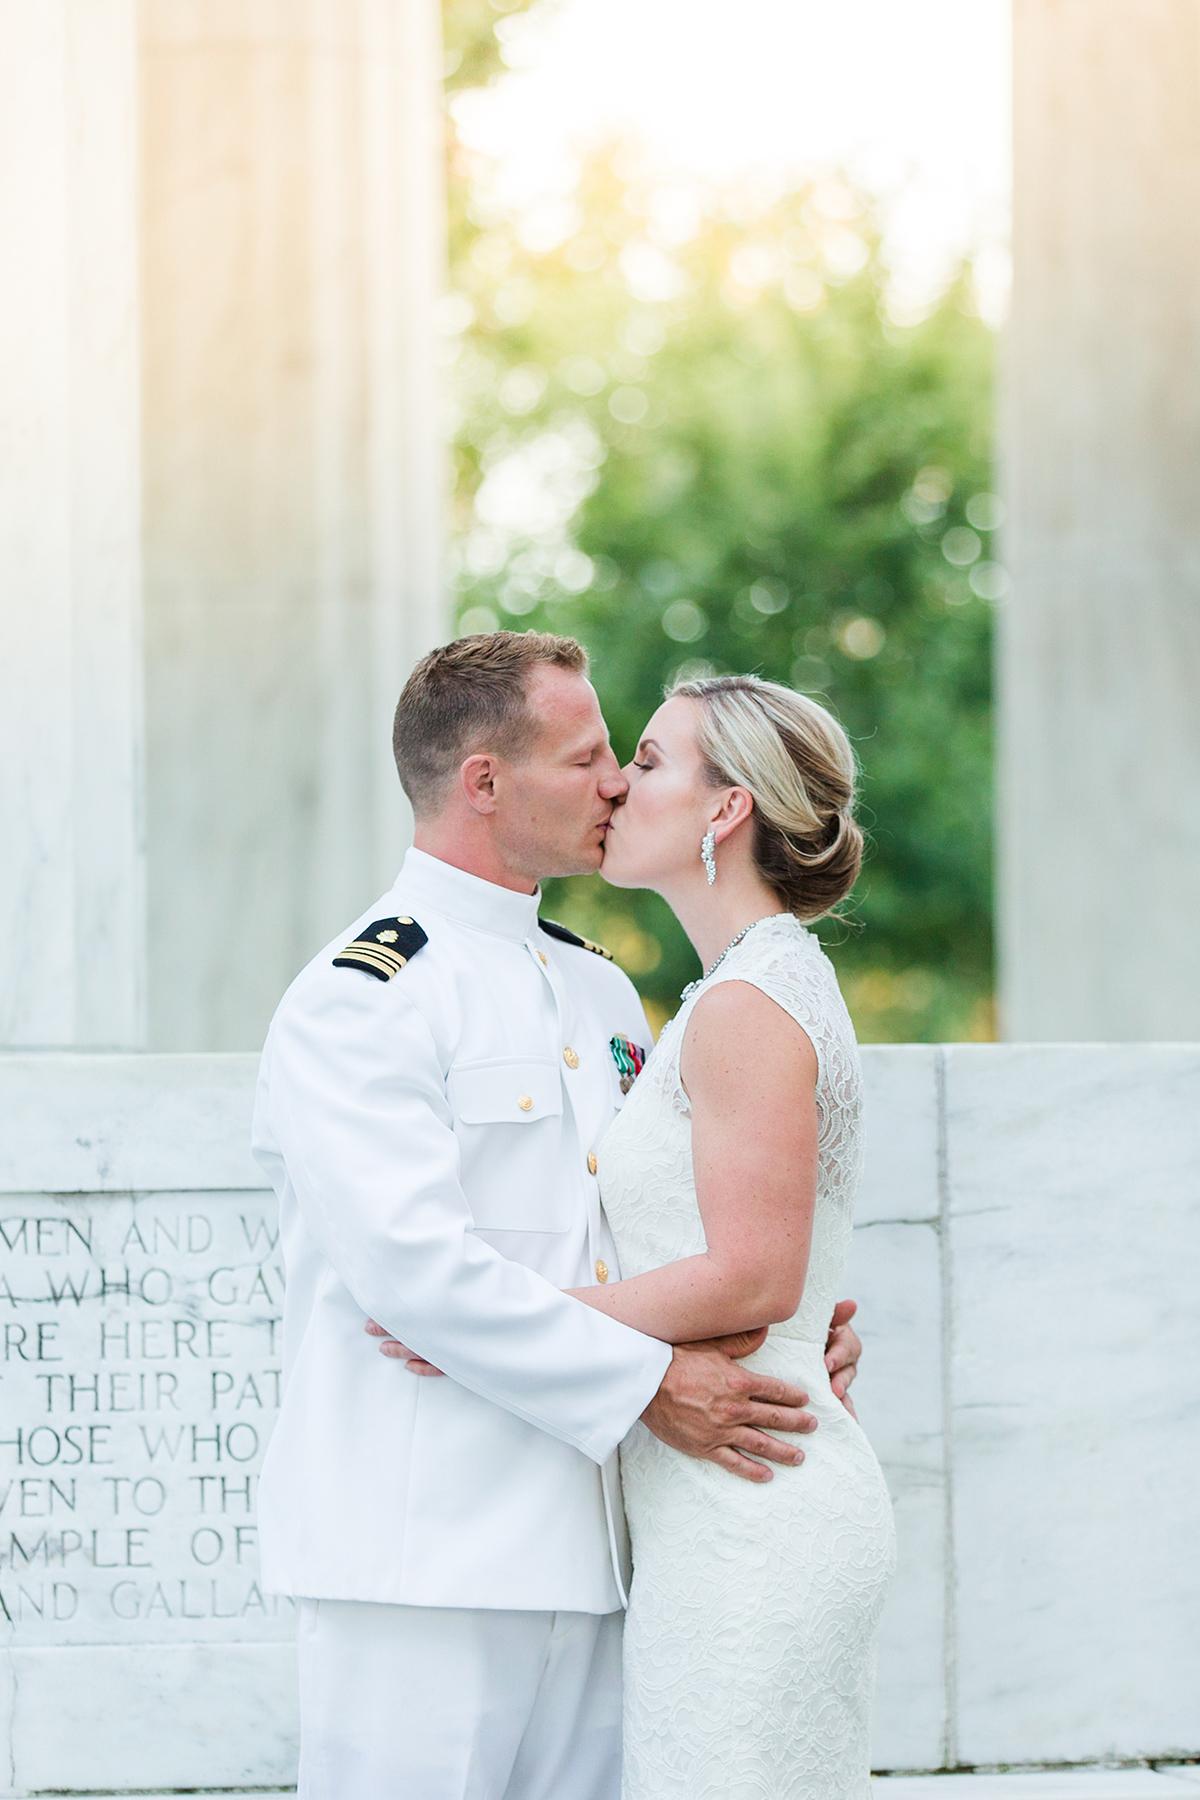 Intimate-Military-Elopement-kiss.jpg